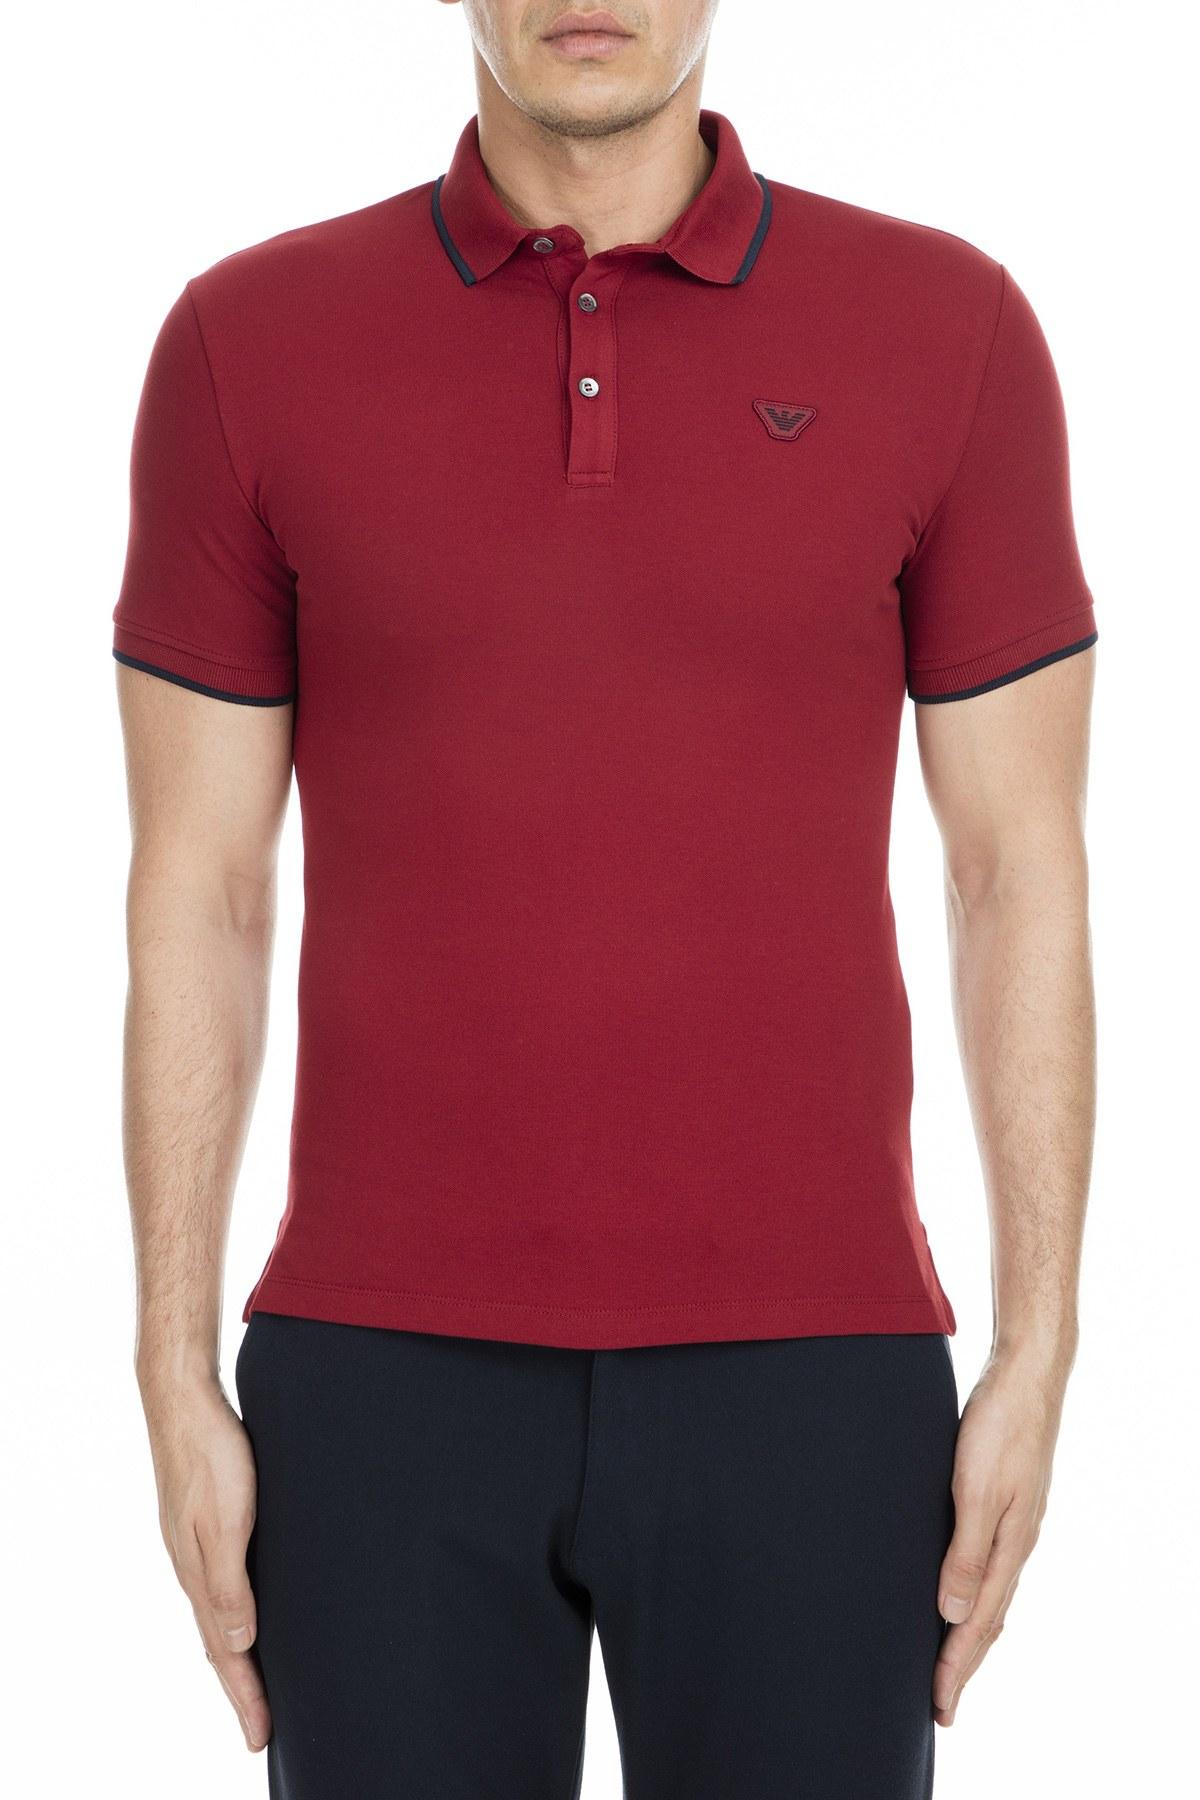 Emporio Armani Erkek T Shirt 6Z1FB6 1J40Z 0343 BORDO